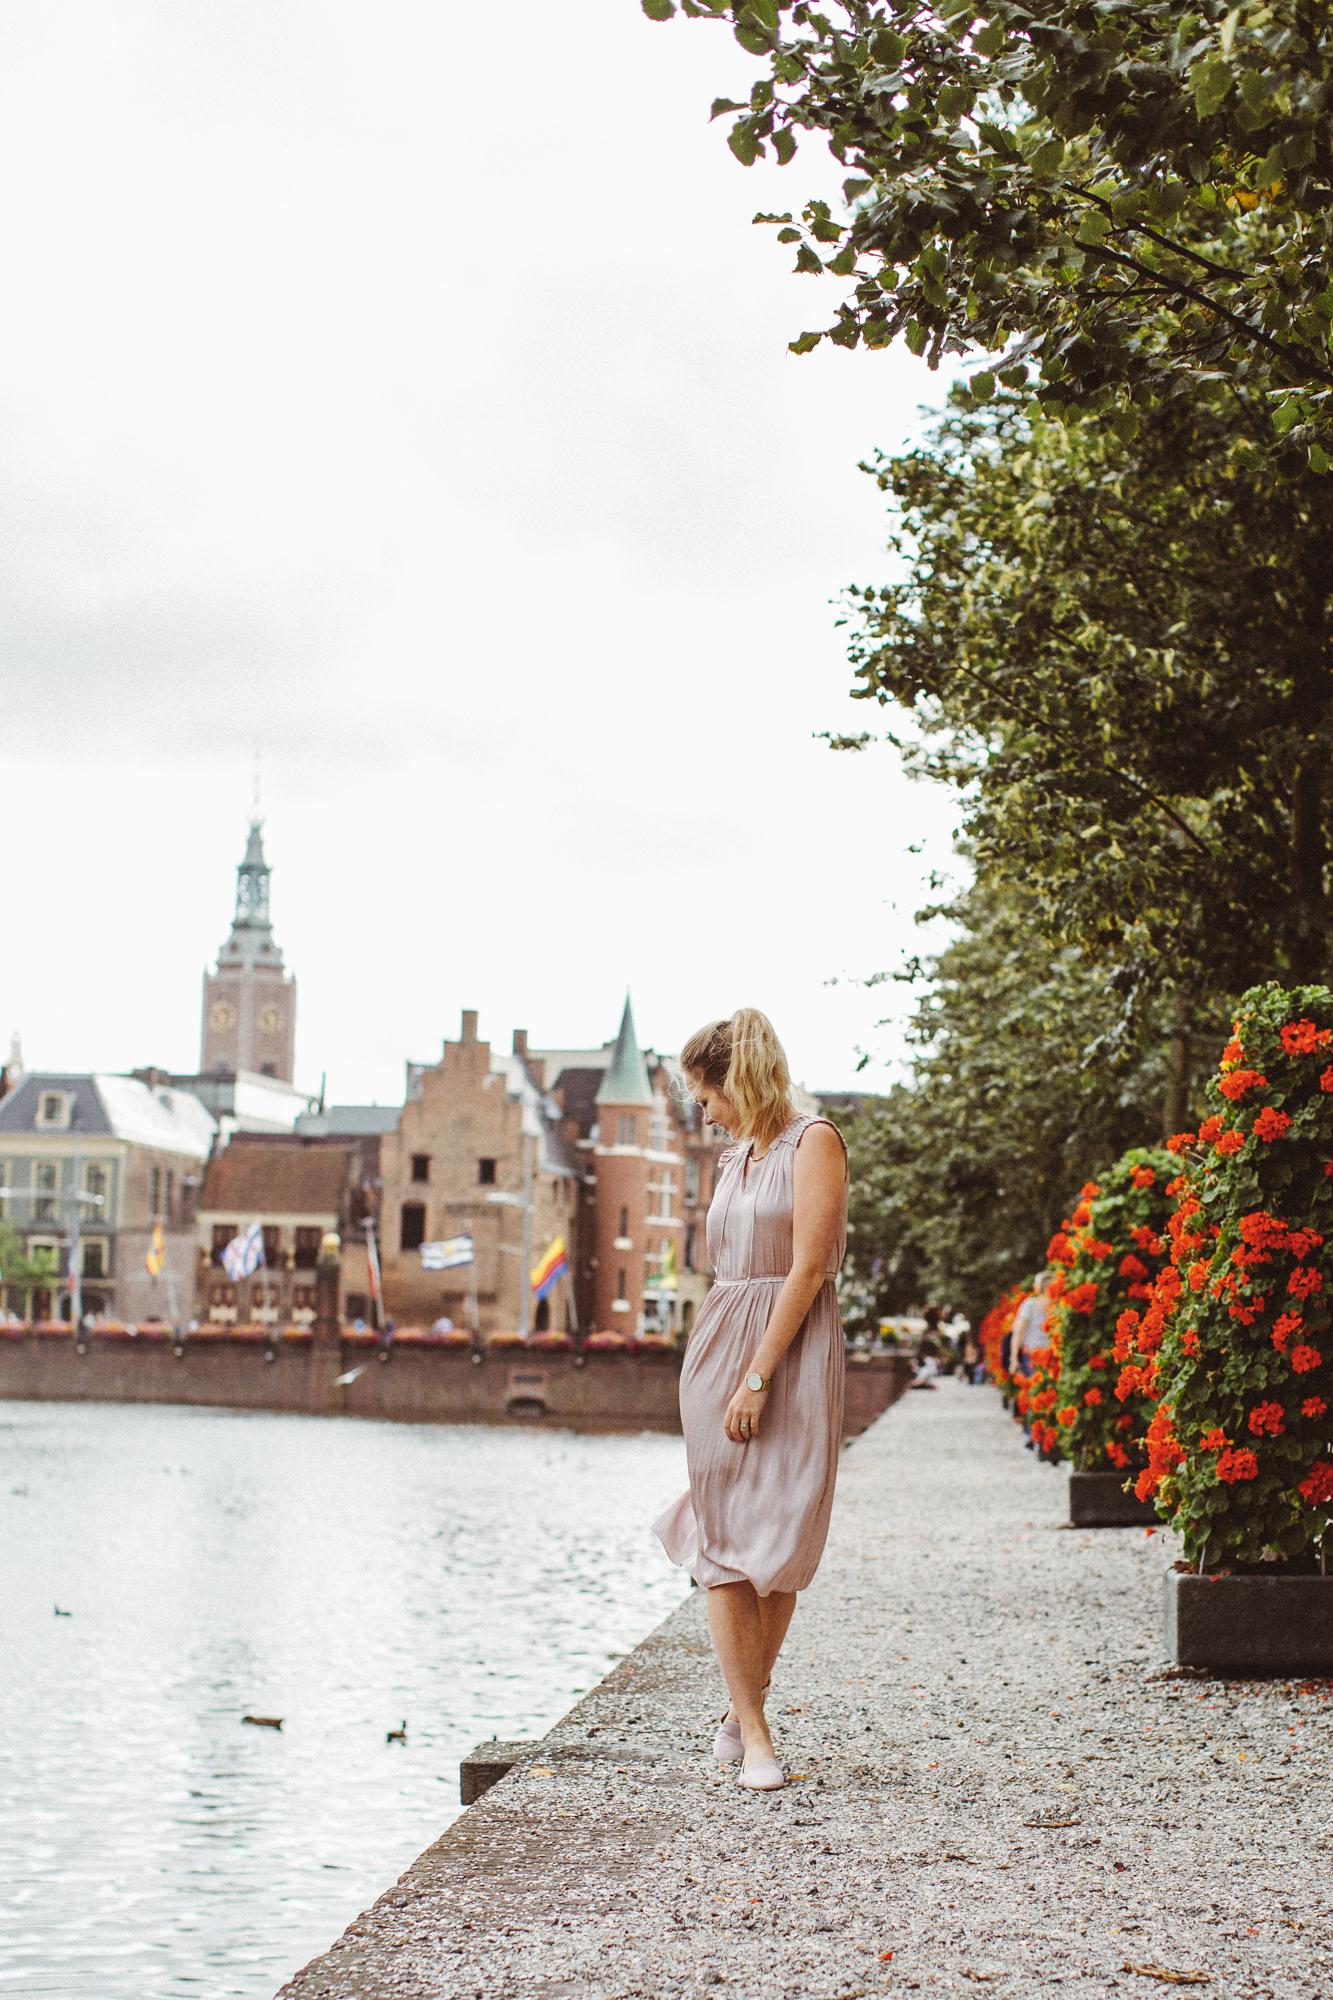 MargaritaCruz.art - the Hague photo session birthday - 5 - 180812.jpg